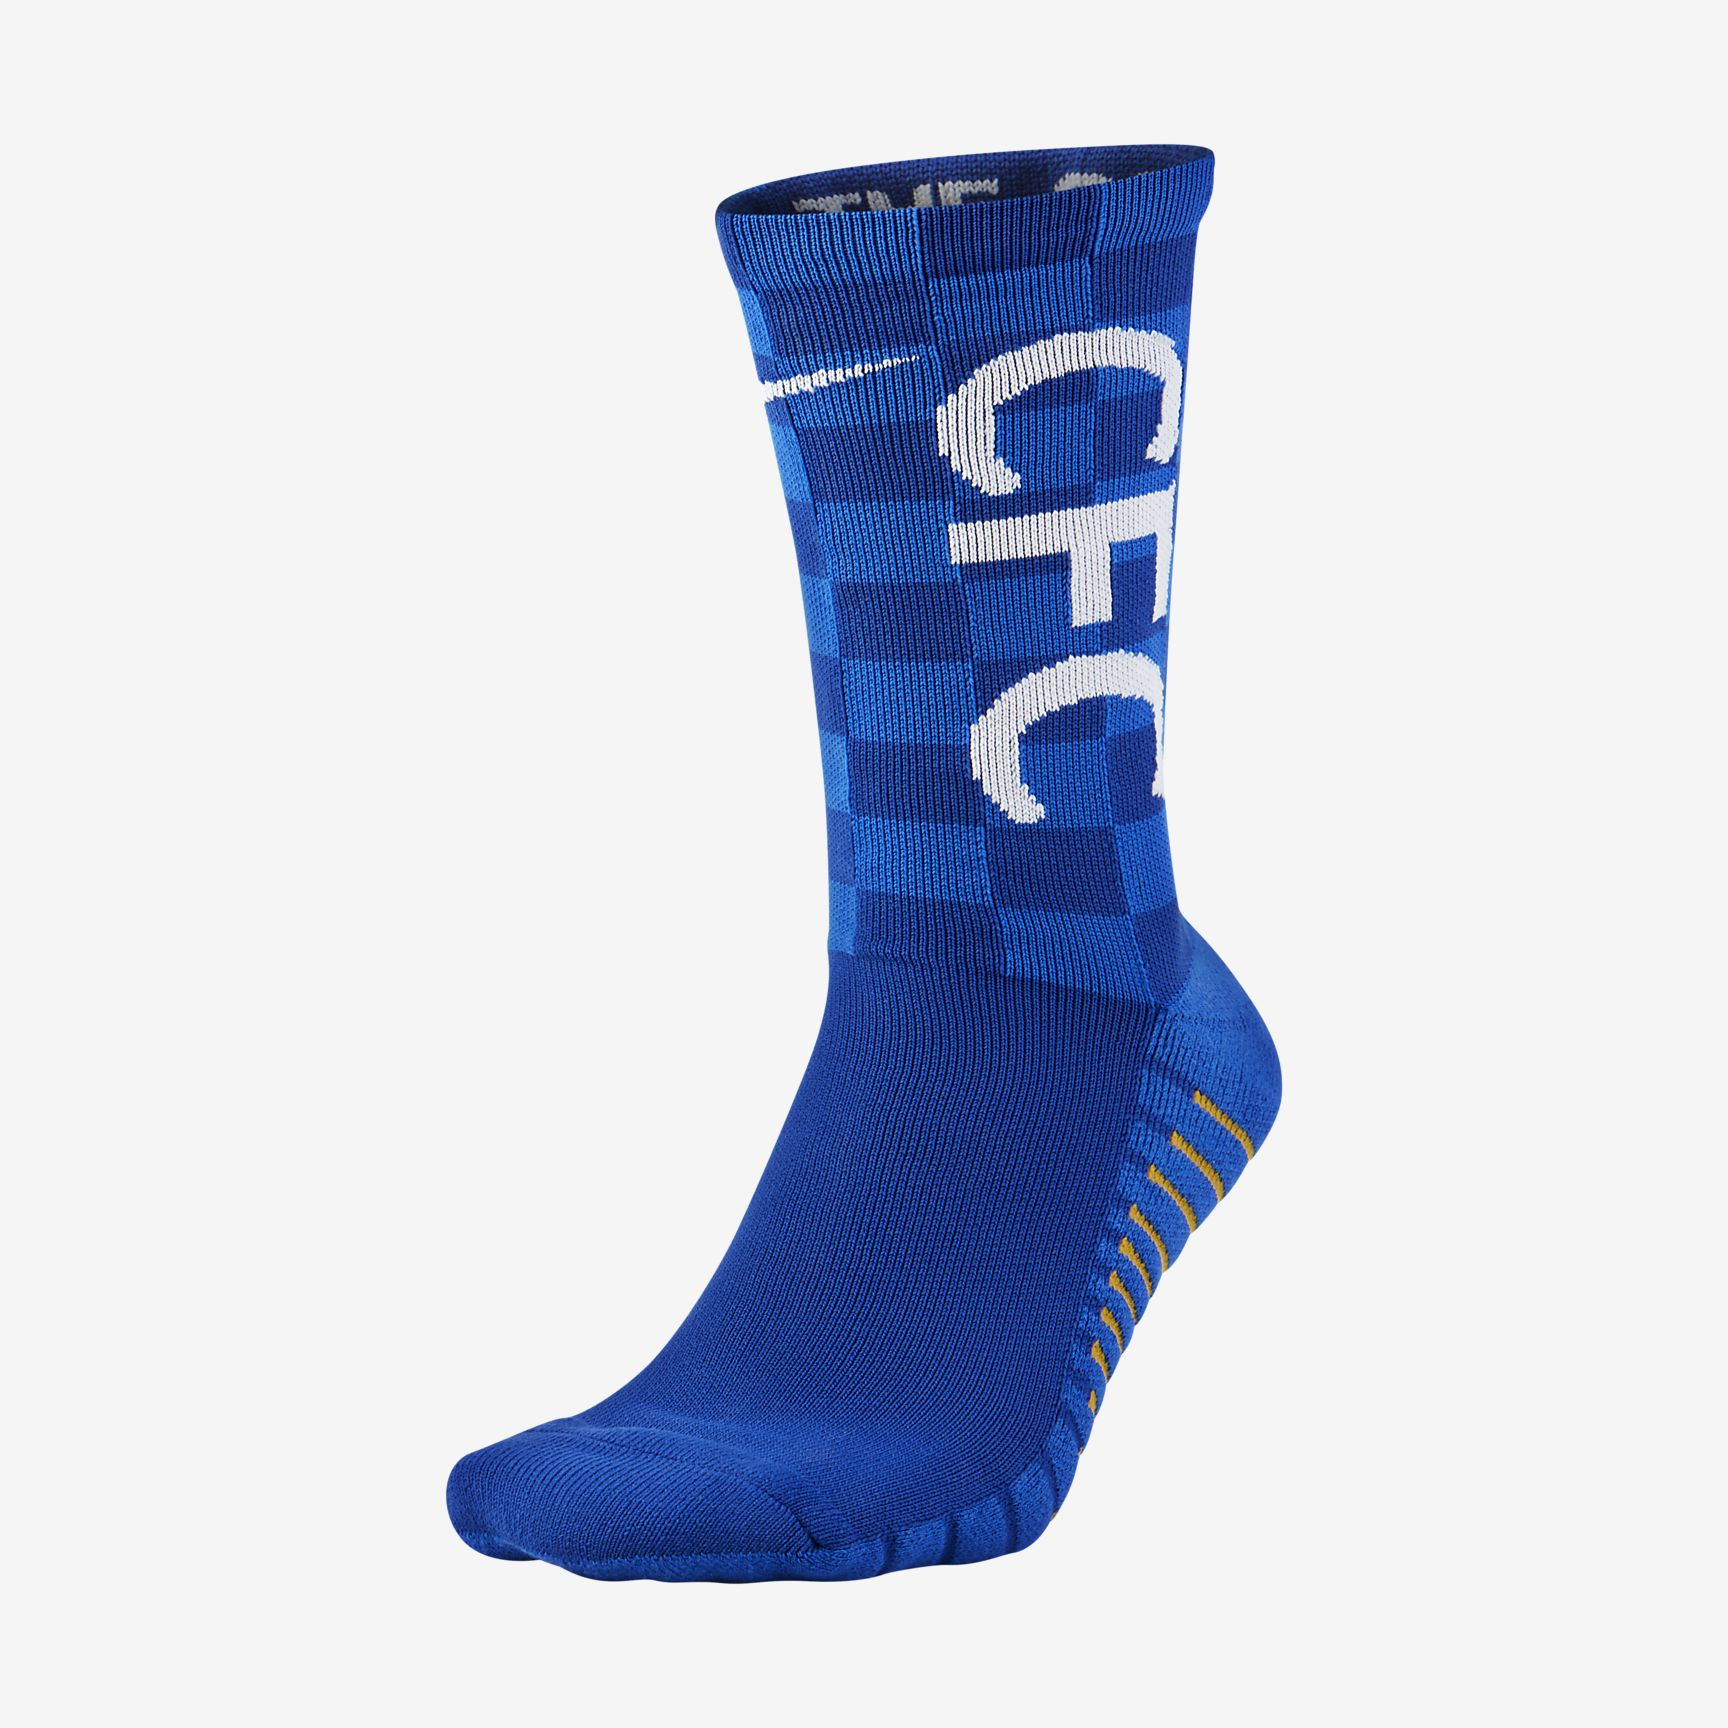 competitive price fe927 2fe17 Nike Chelsea FC 2018-19 Football Crew Socks - Soccer Shop ...